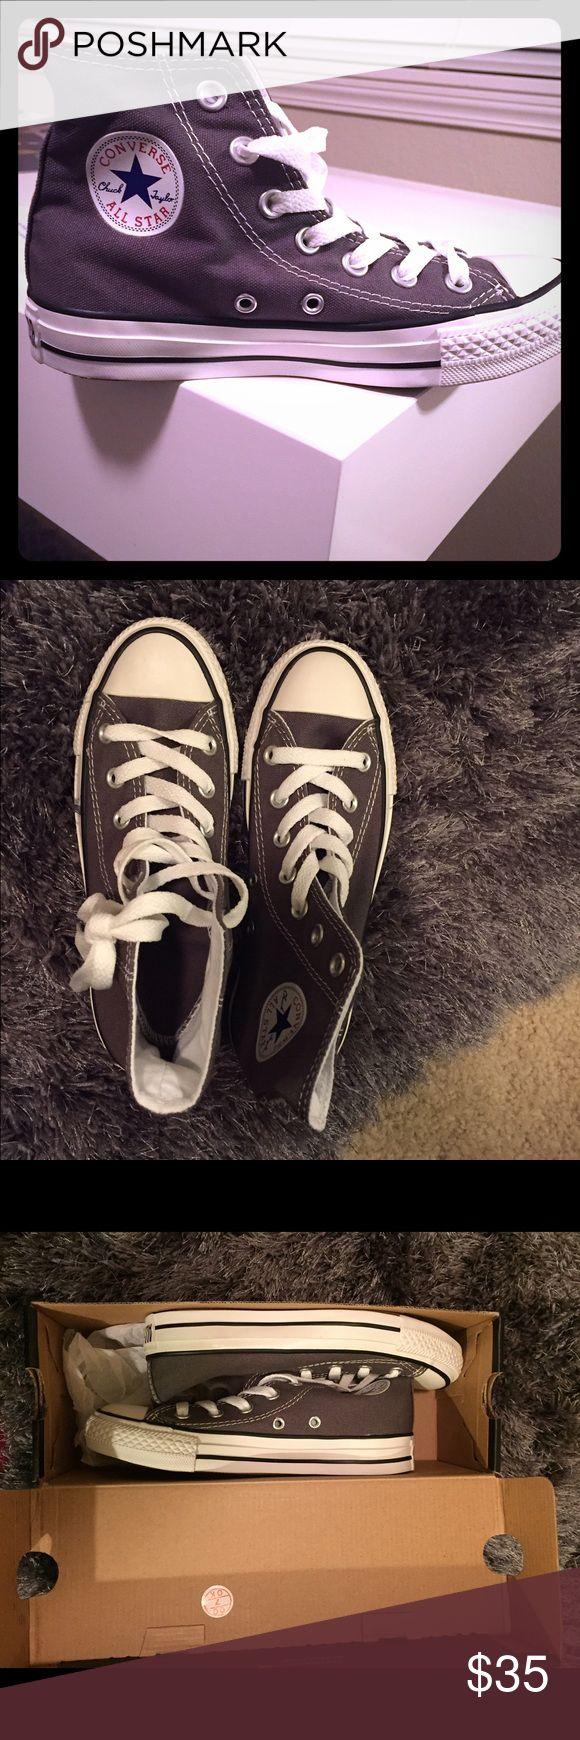 Dark gray high top Converse Brand New, never been worn. Gray high top Converse. Converse Shoes Sneakers